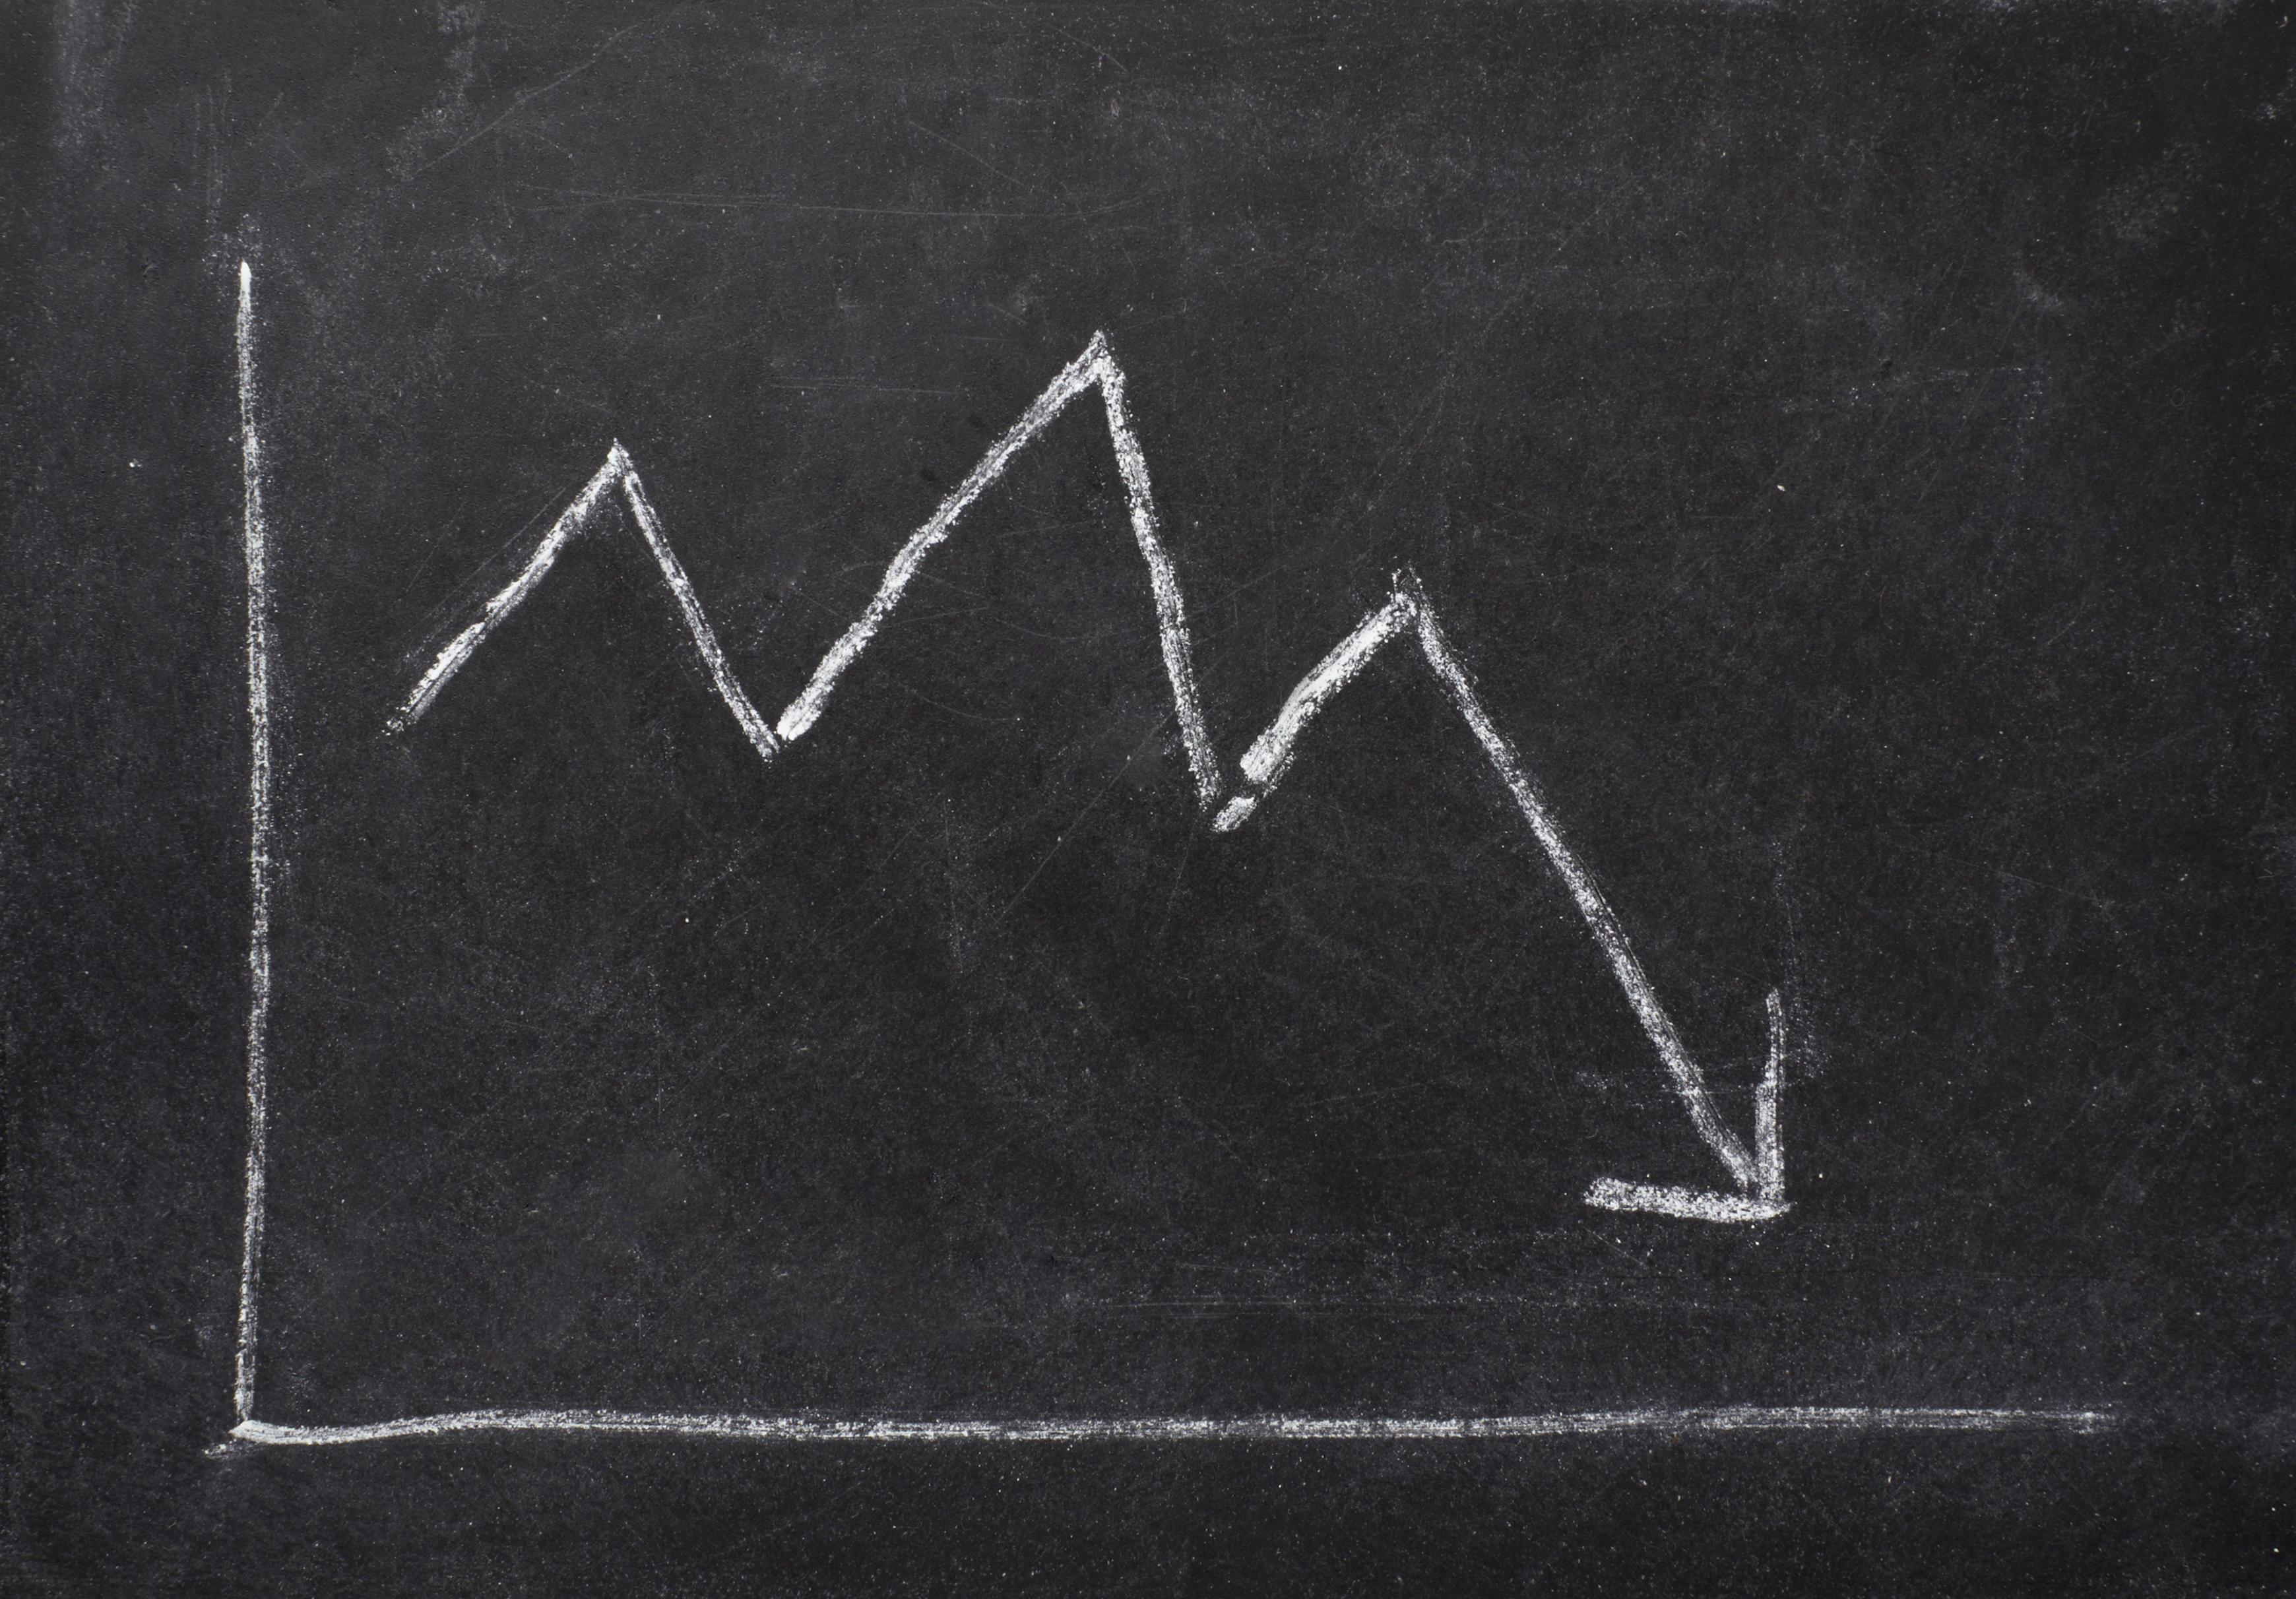 A chalkboard sketch of a downward-trending chart.